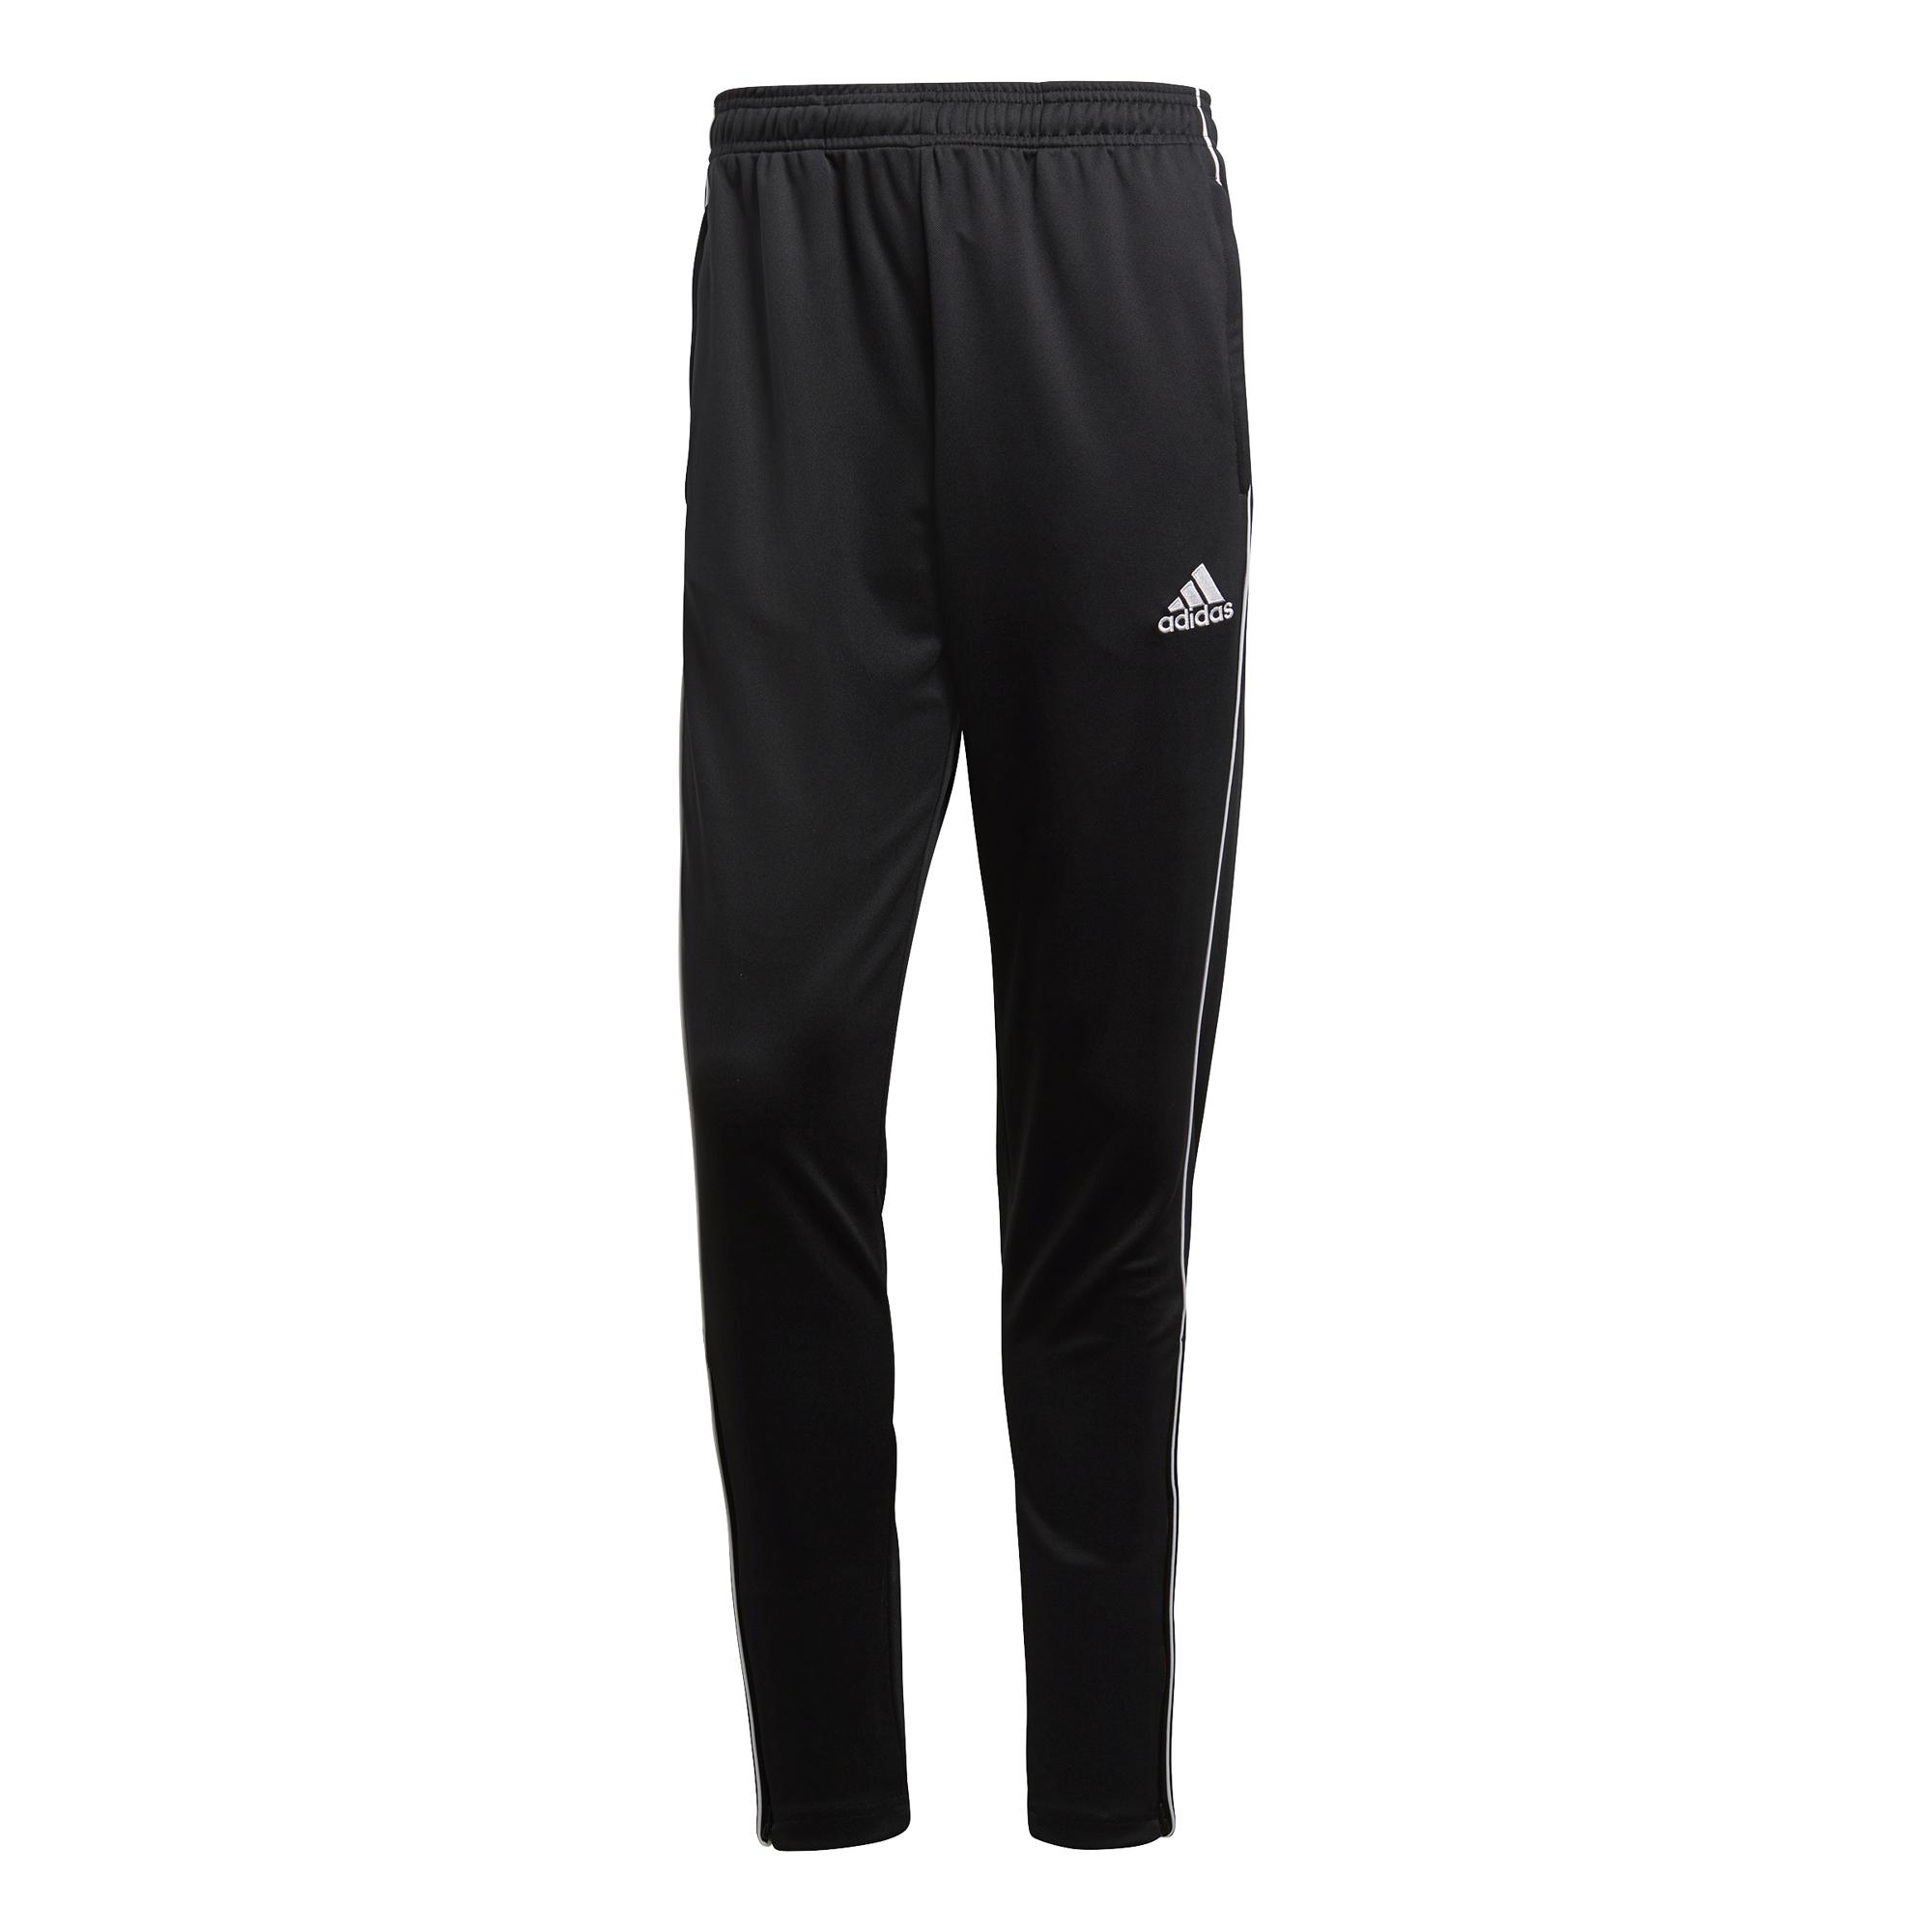 ADIDAS tréninkové kalhoty Core 18